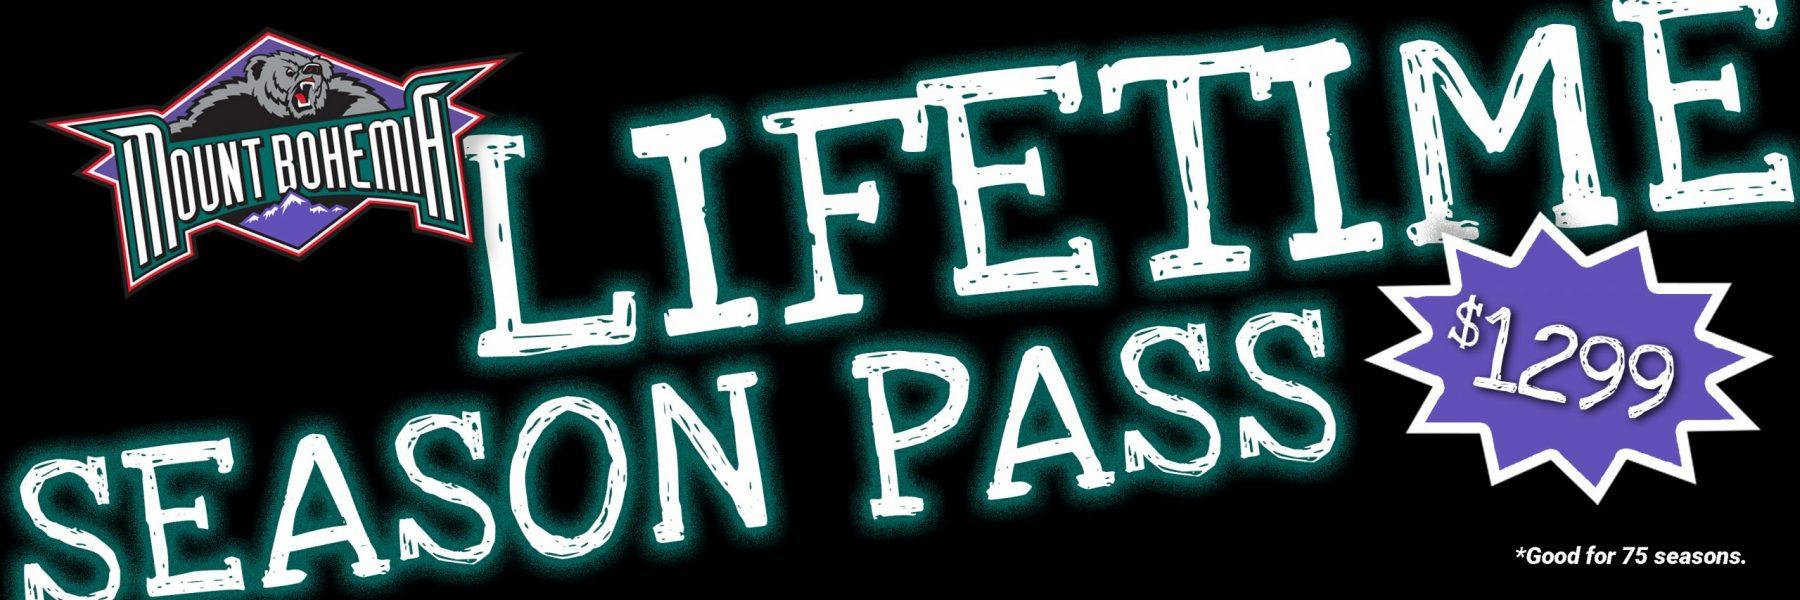 lifetime season pass